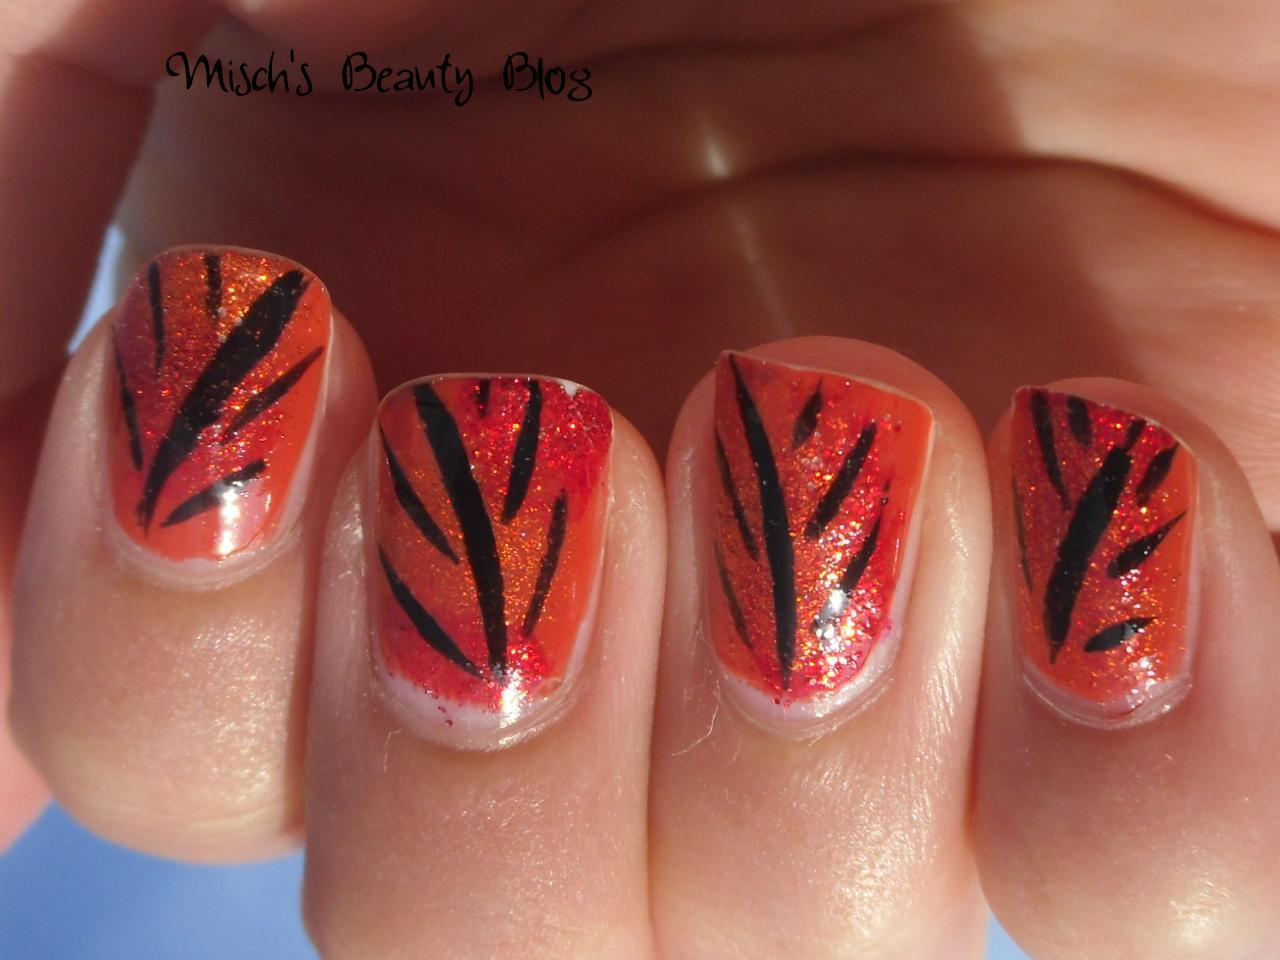 Misch's Beauty Blog: NOTD September 29th: Fall Leaf Nail Art